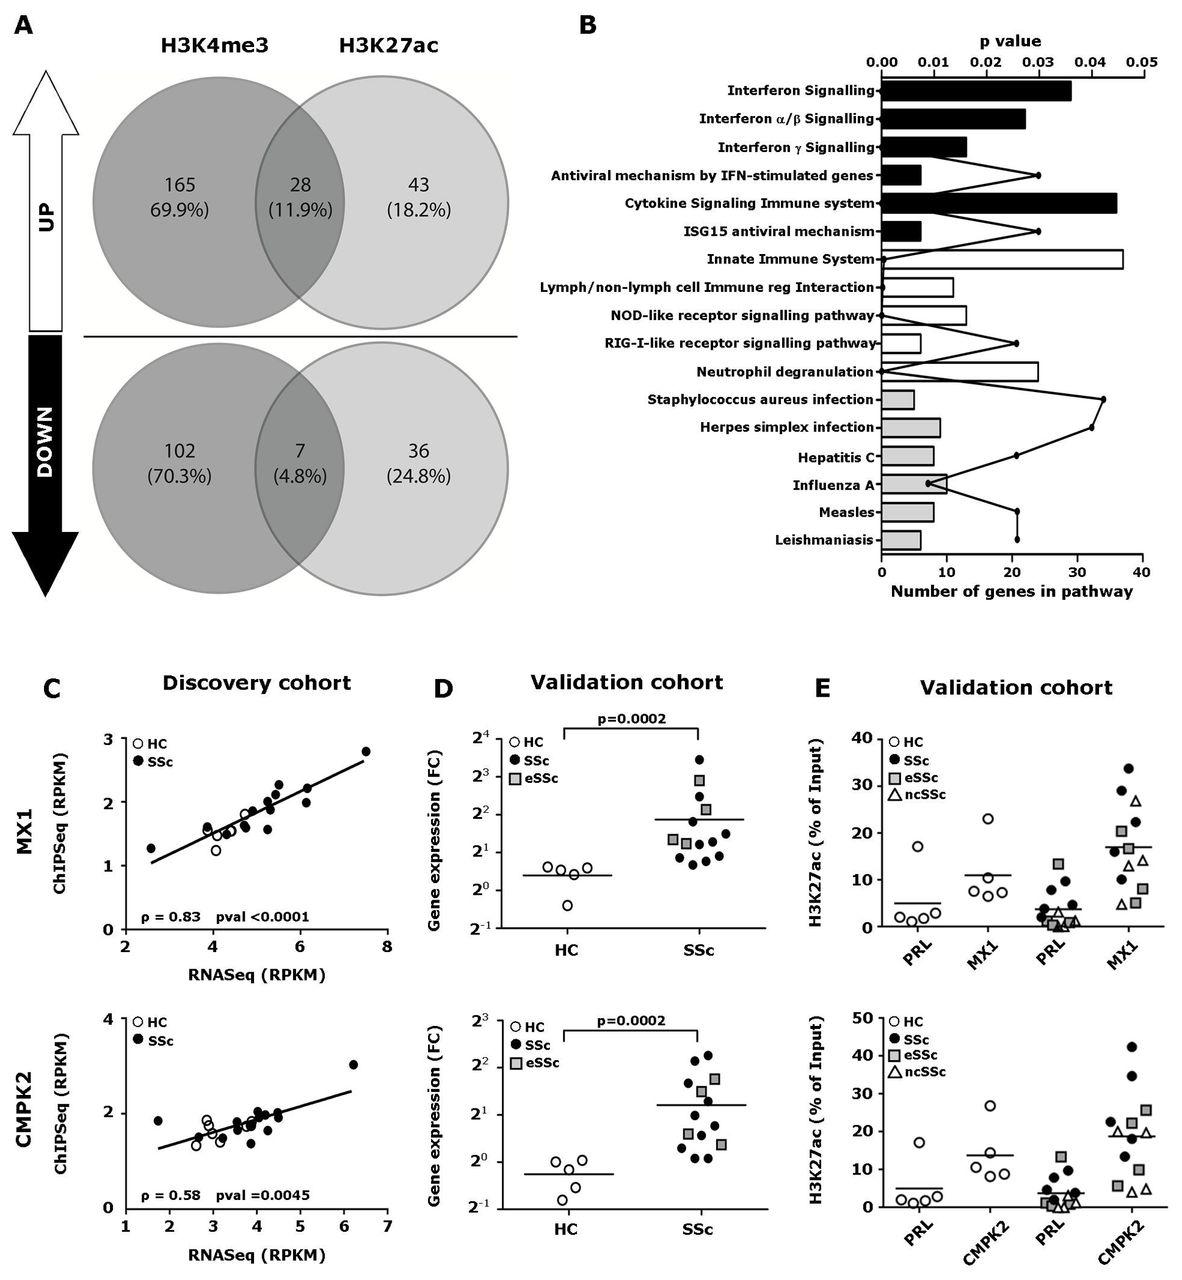 Shared Epigenetic Changes Underlie >> Histone Modifications Underlie Monocyte Dysregulation In Patients